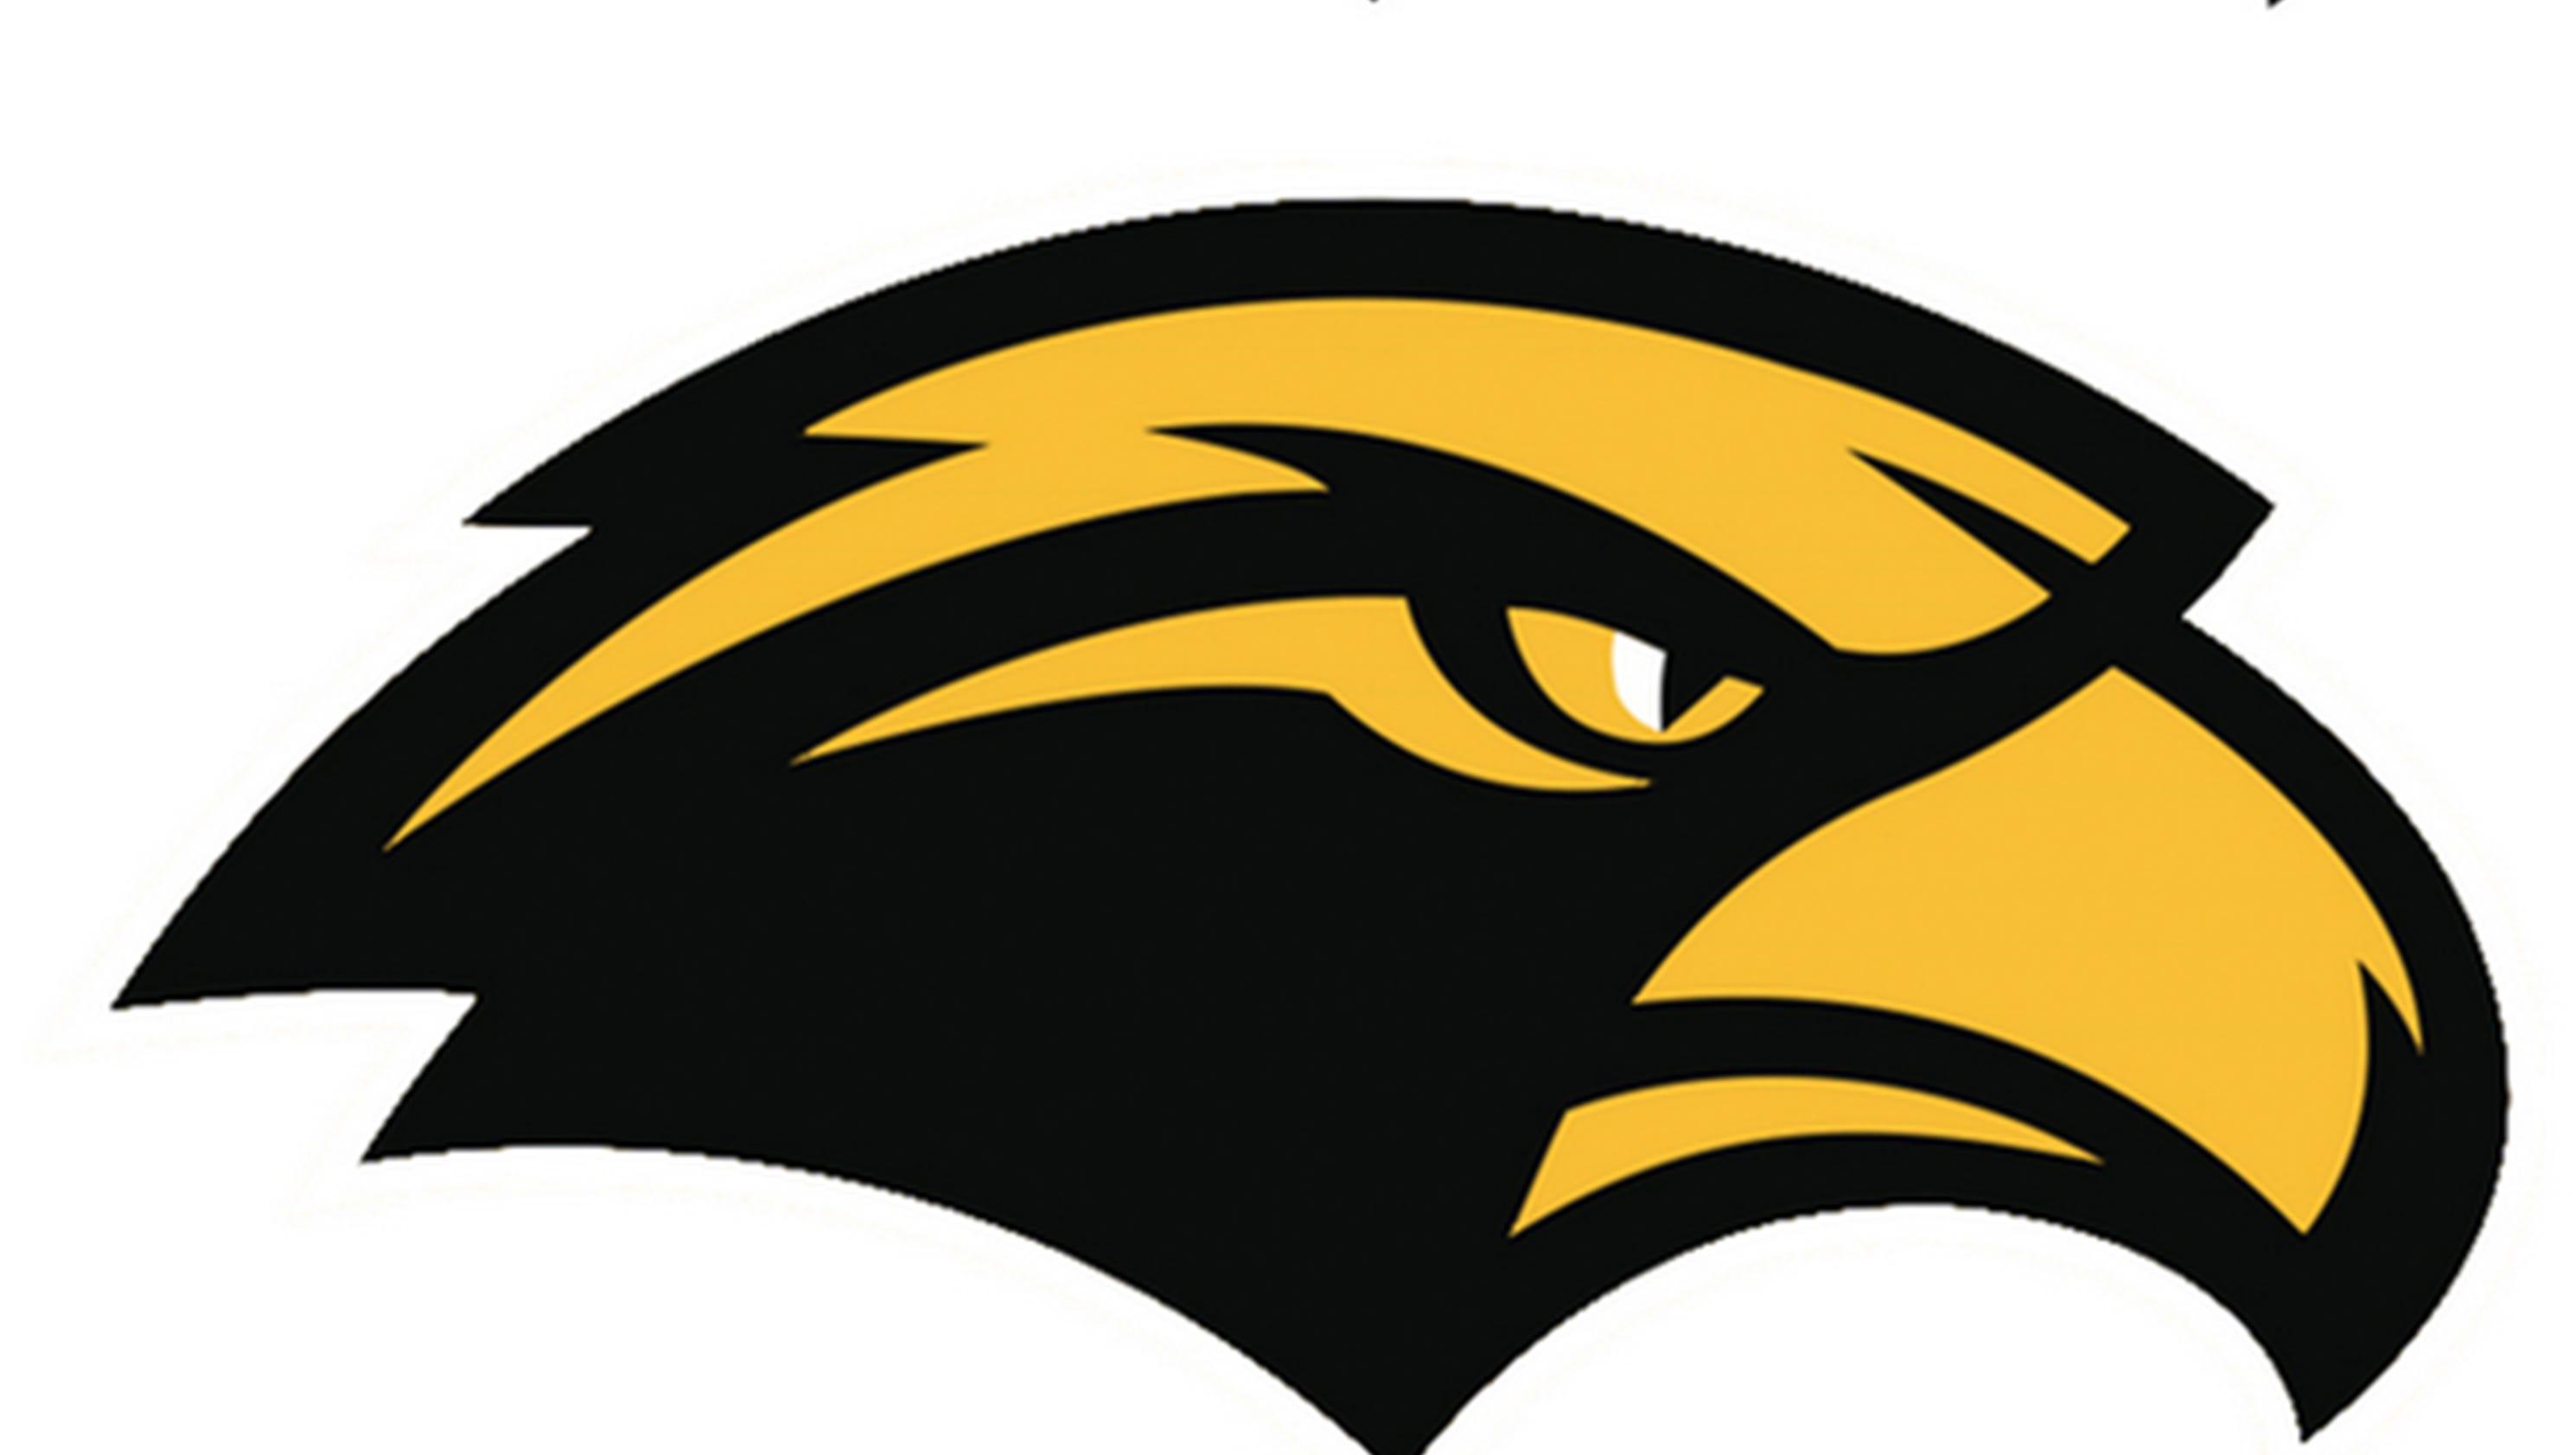 southern miss unveils new golden eagle logo options eagle school mascot clipart eagle school mascot clipart